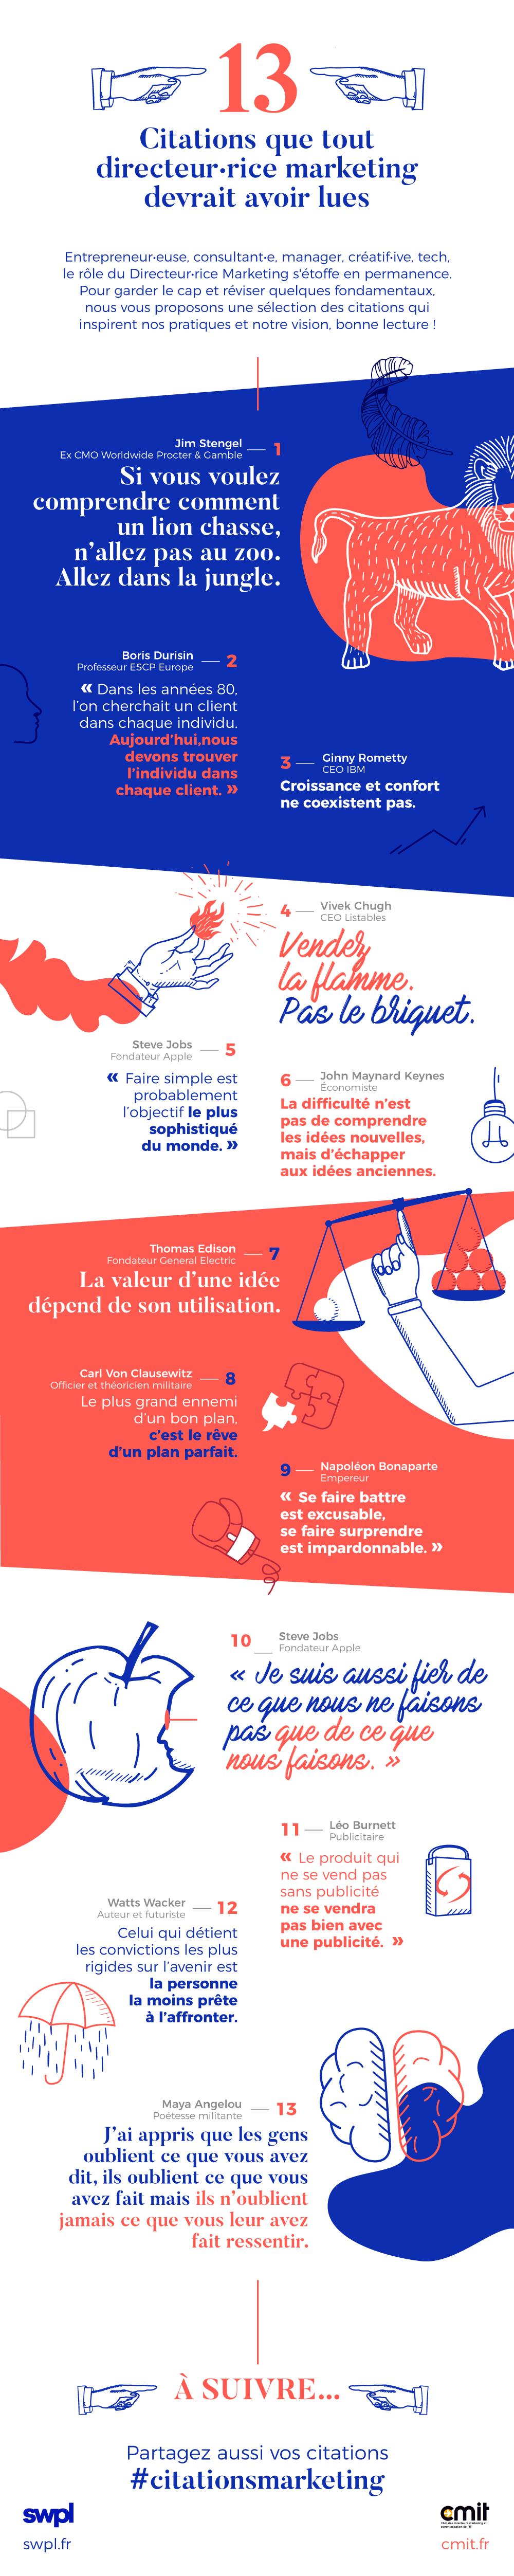 infographie citations marketing CMIT